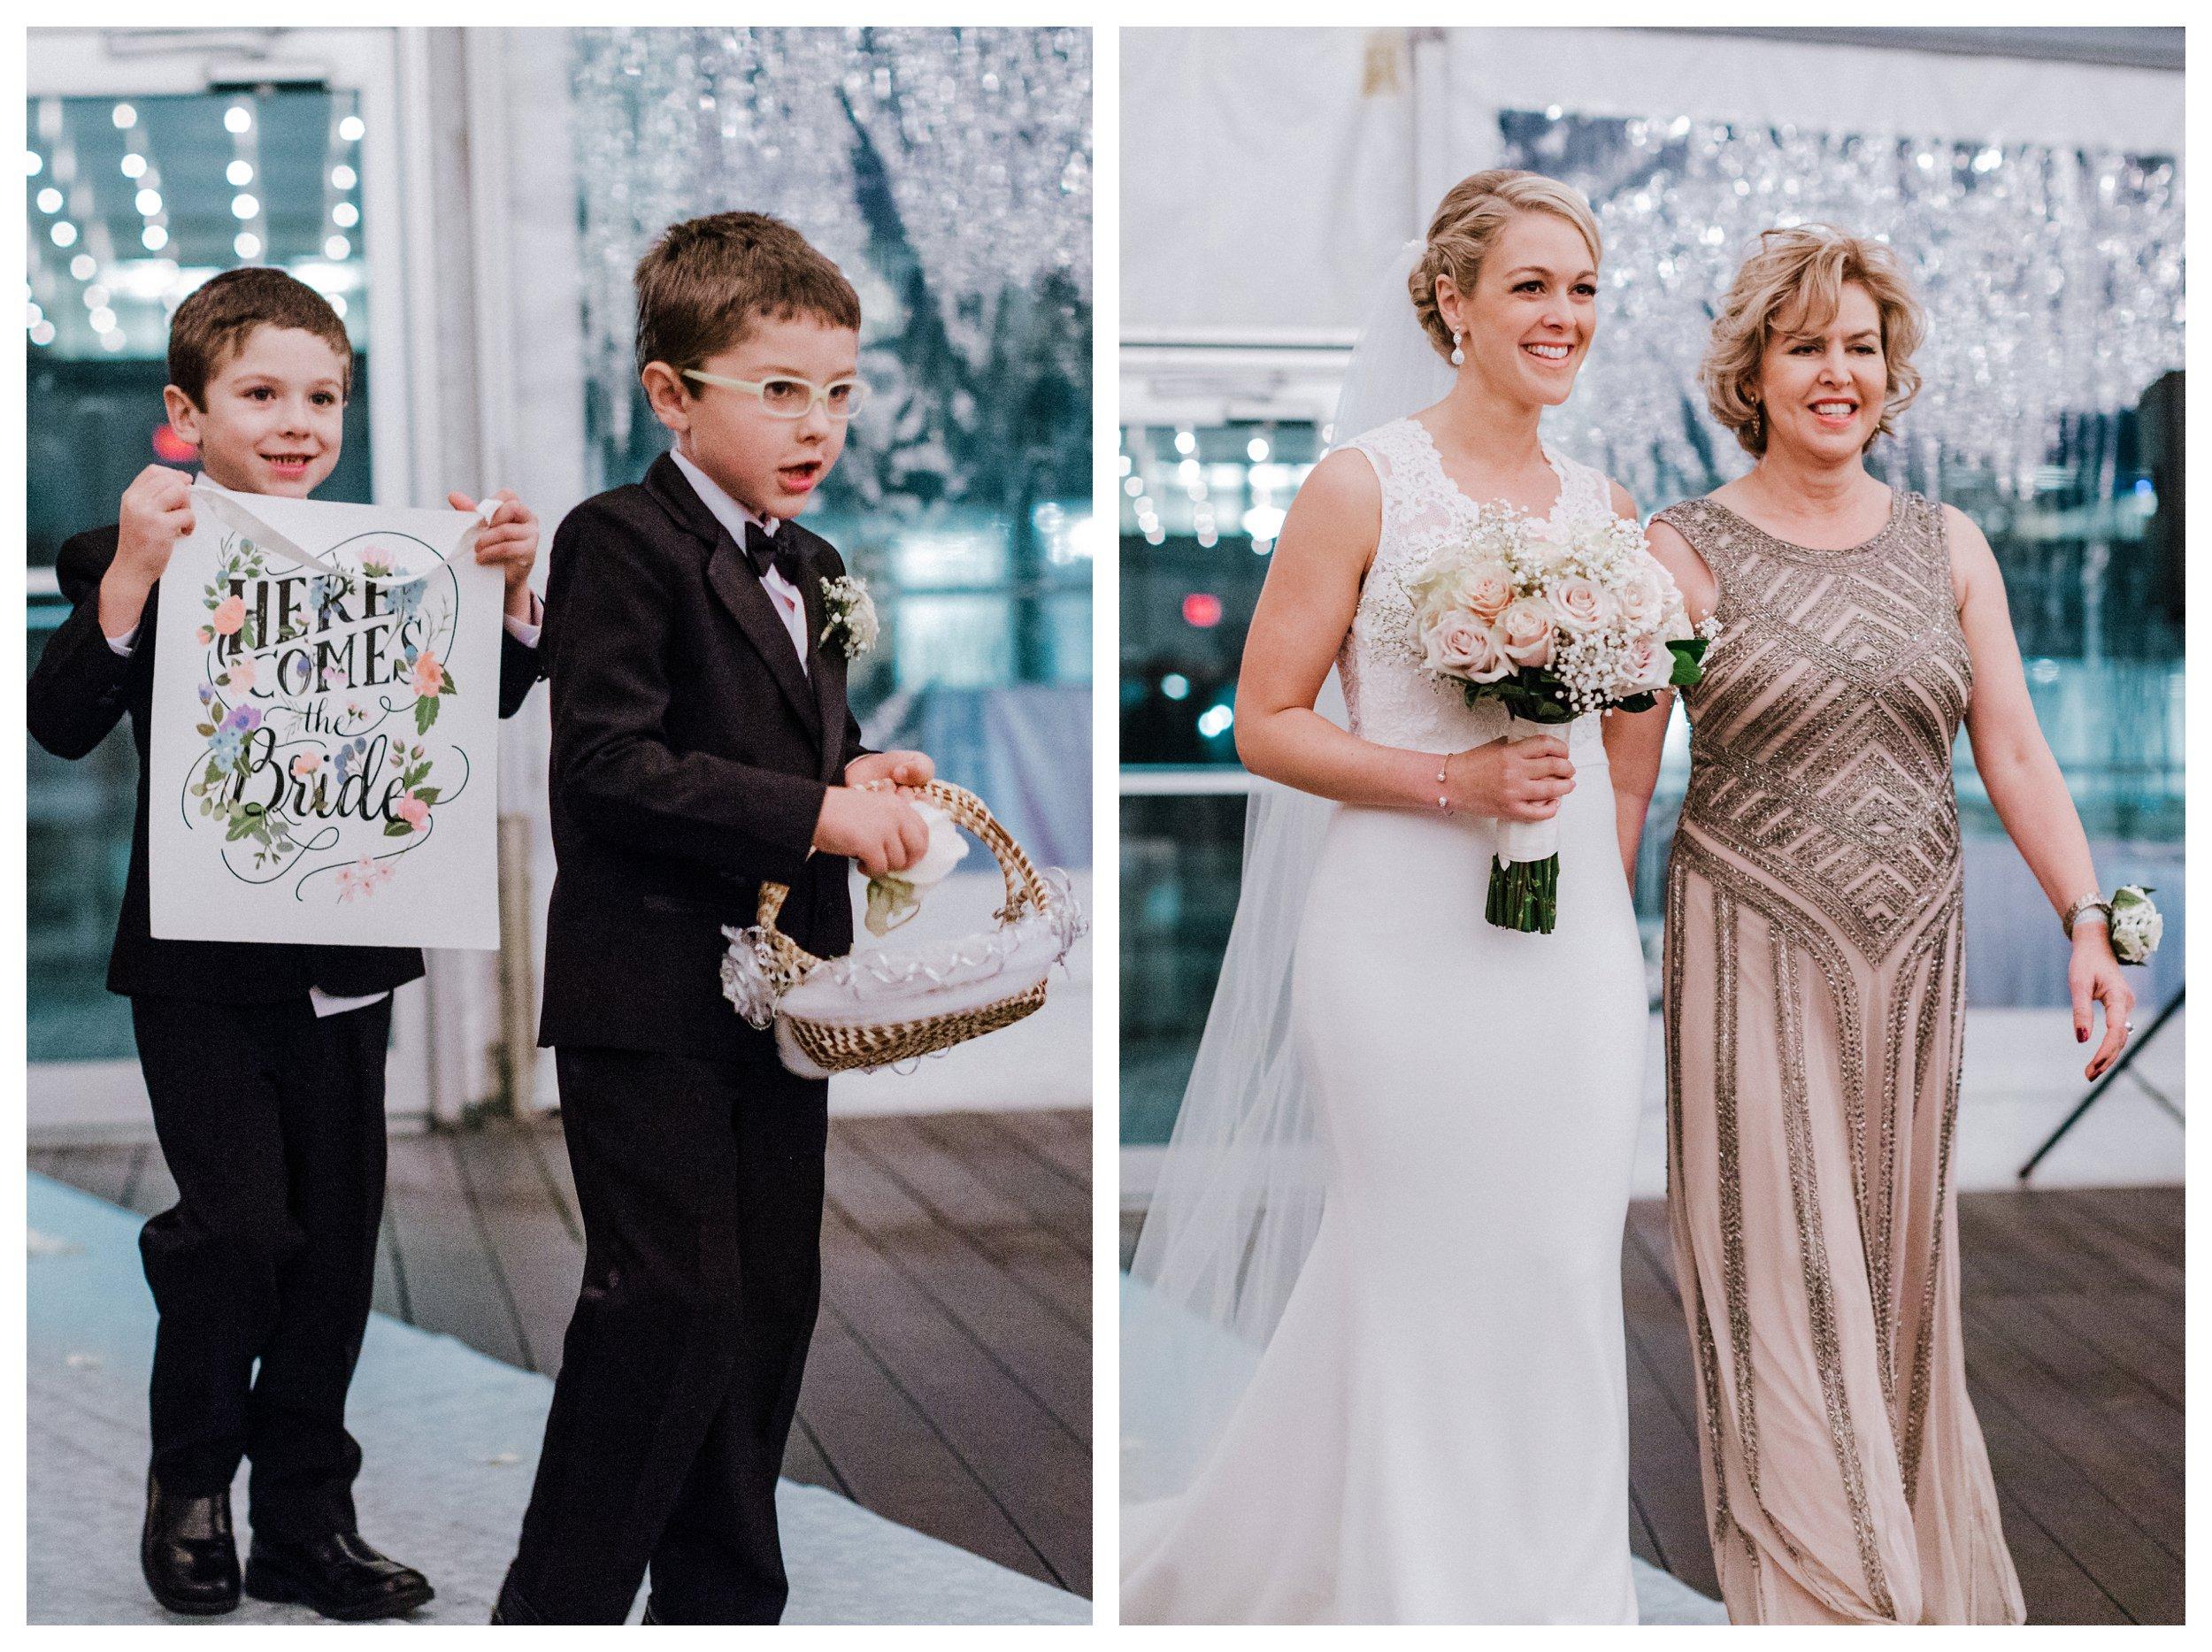 washington-dc-wedding-photographer-34.JPG